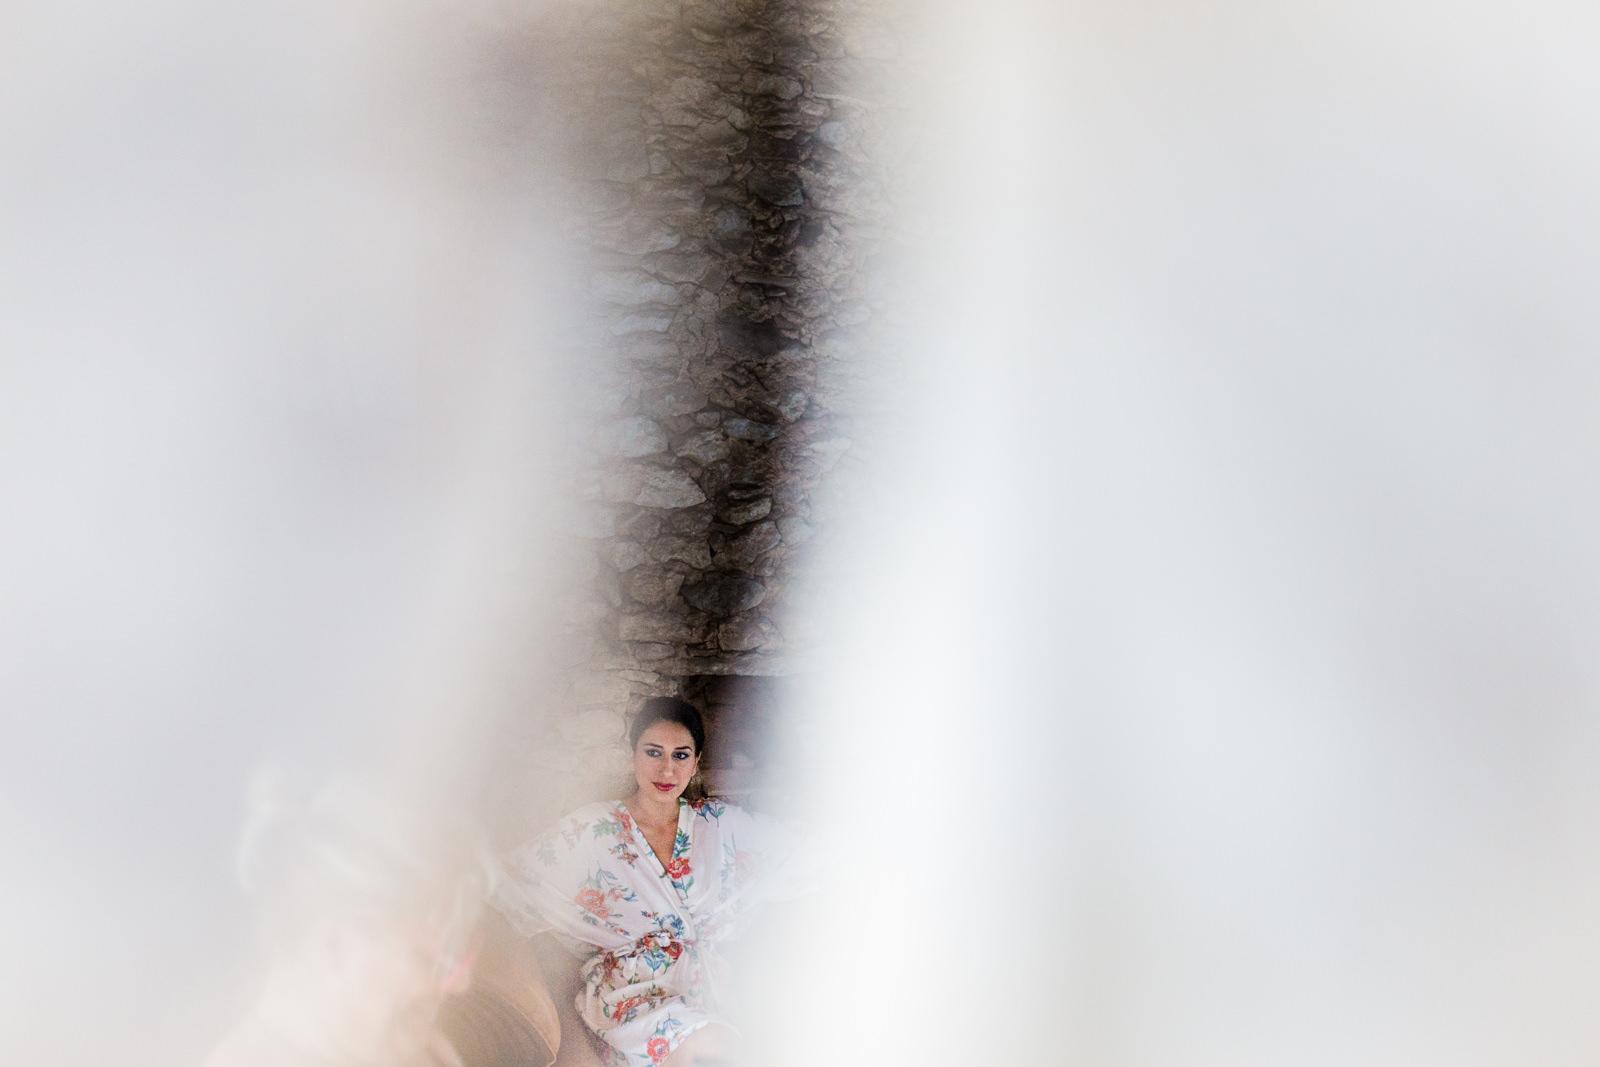 Almirall-Font-sitges-marbella-engagement-Rafael-Torres-fotografo-bodas-sevilla-madrid-barcelona-wedding-photographer--10.jpg